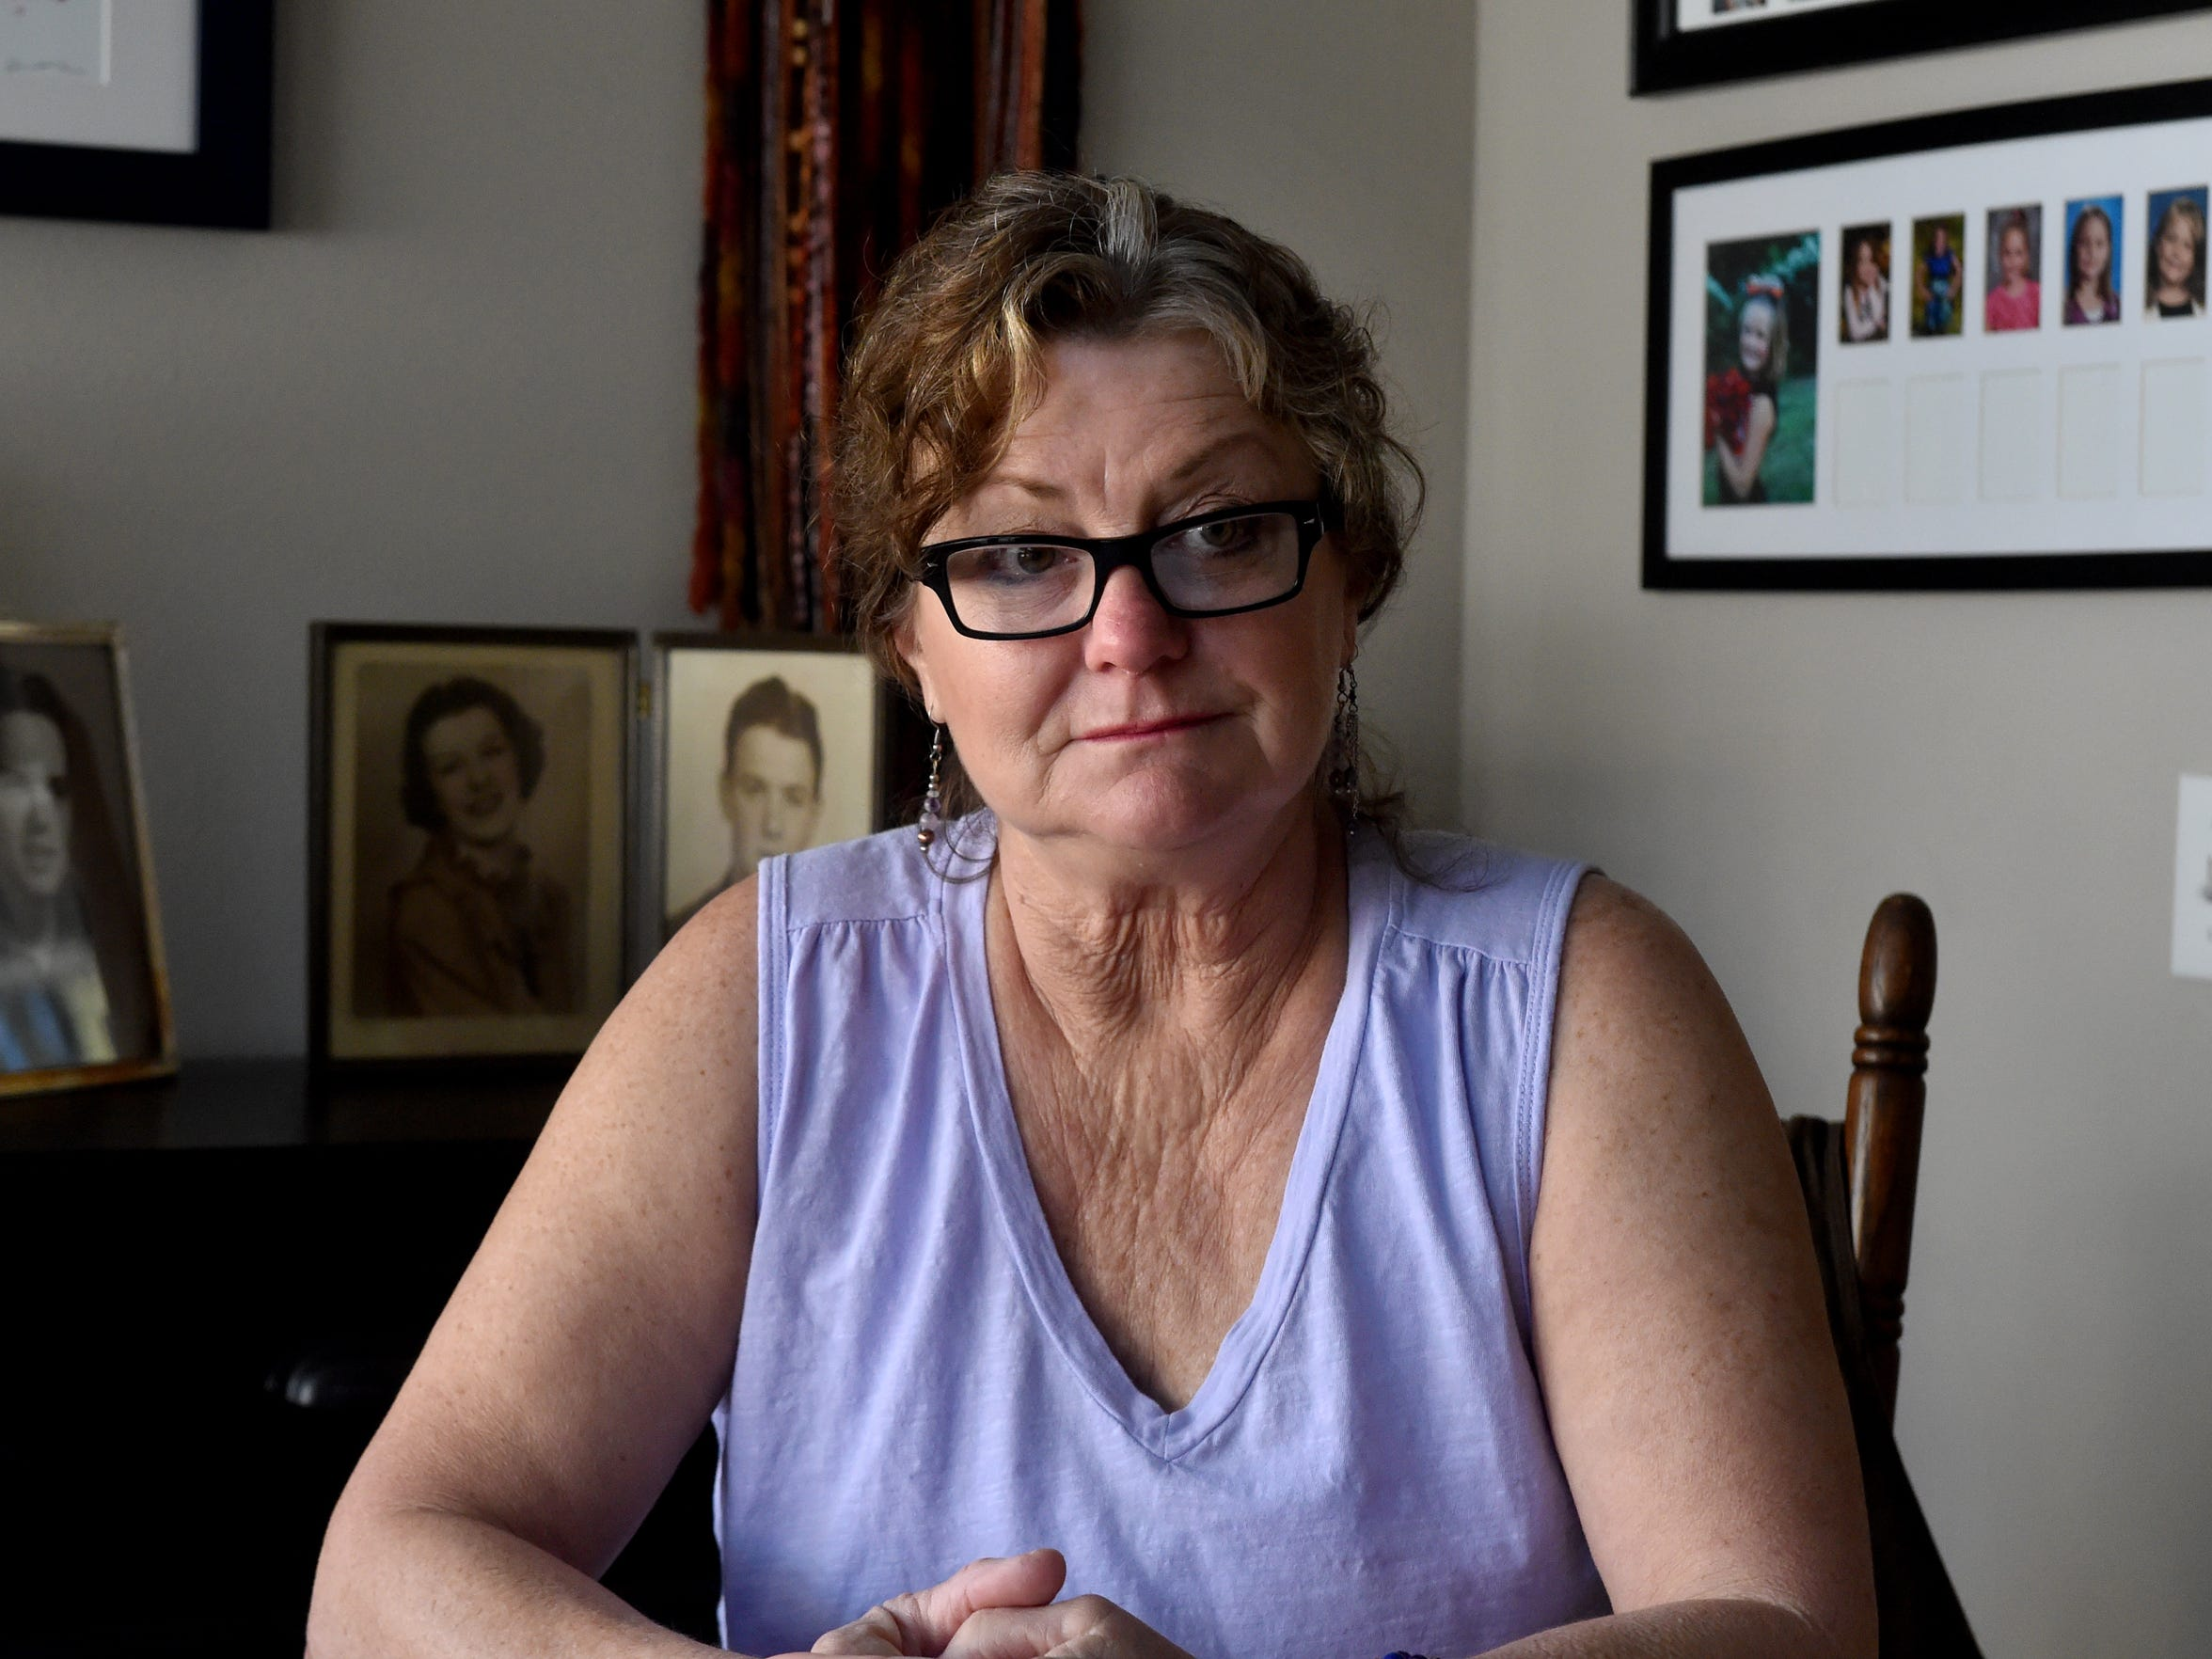 Debra Zinskey, a recently retired dispatch training